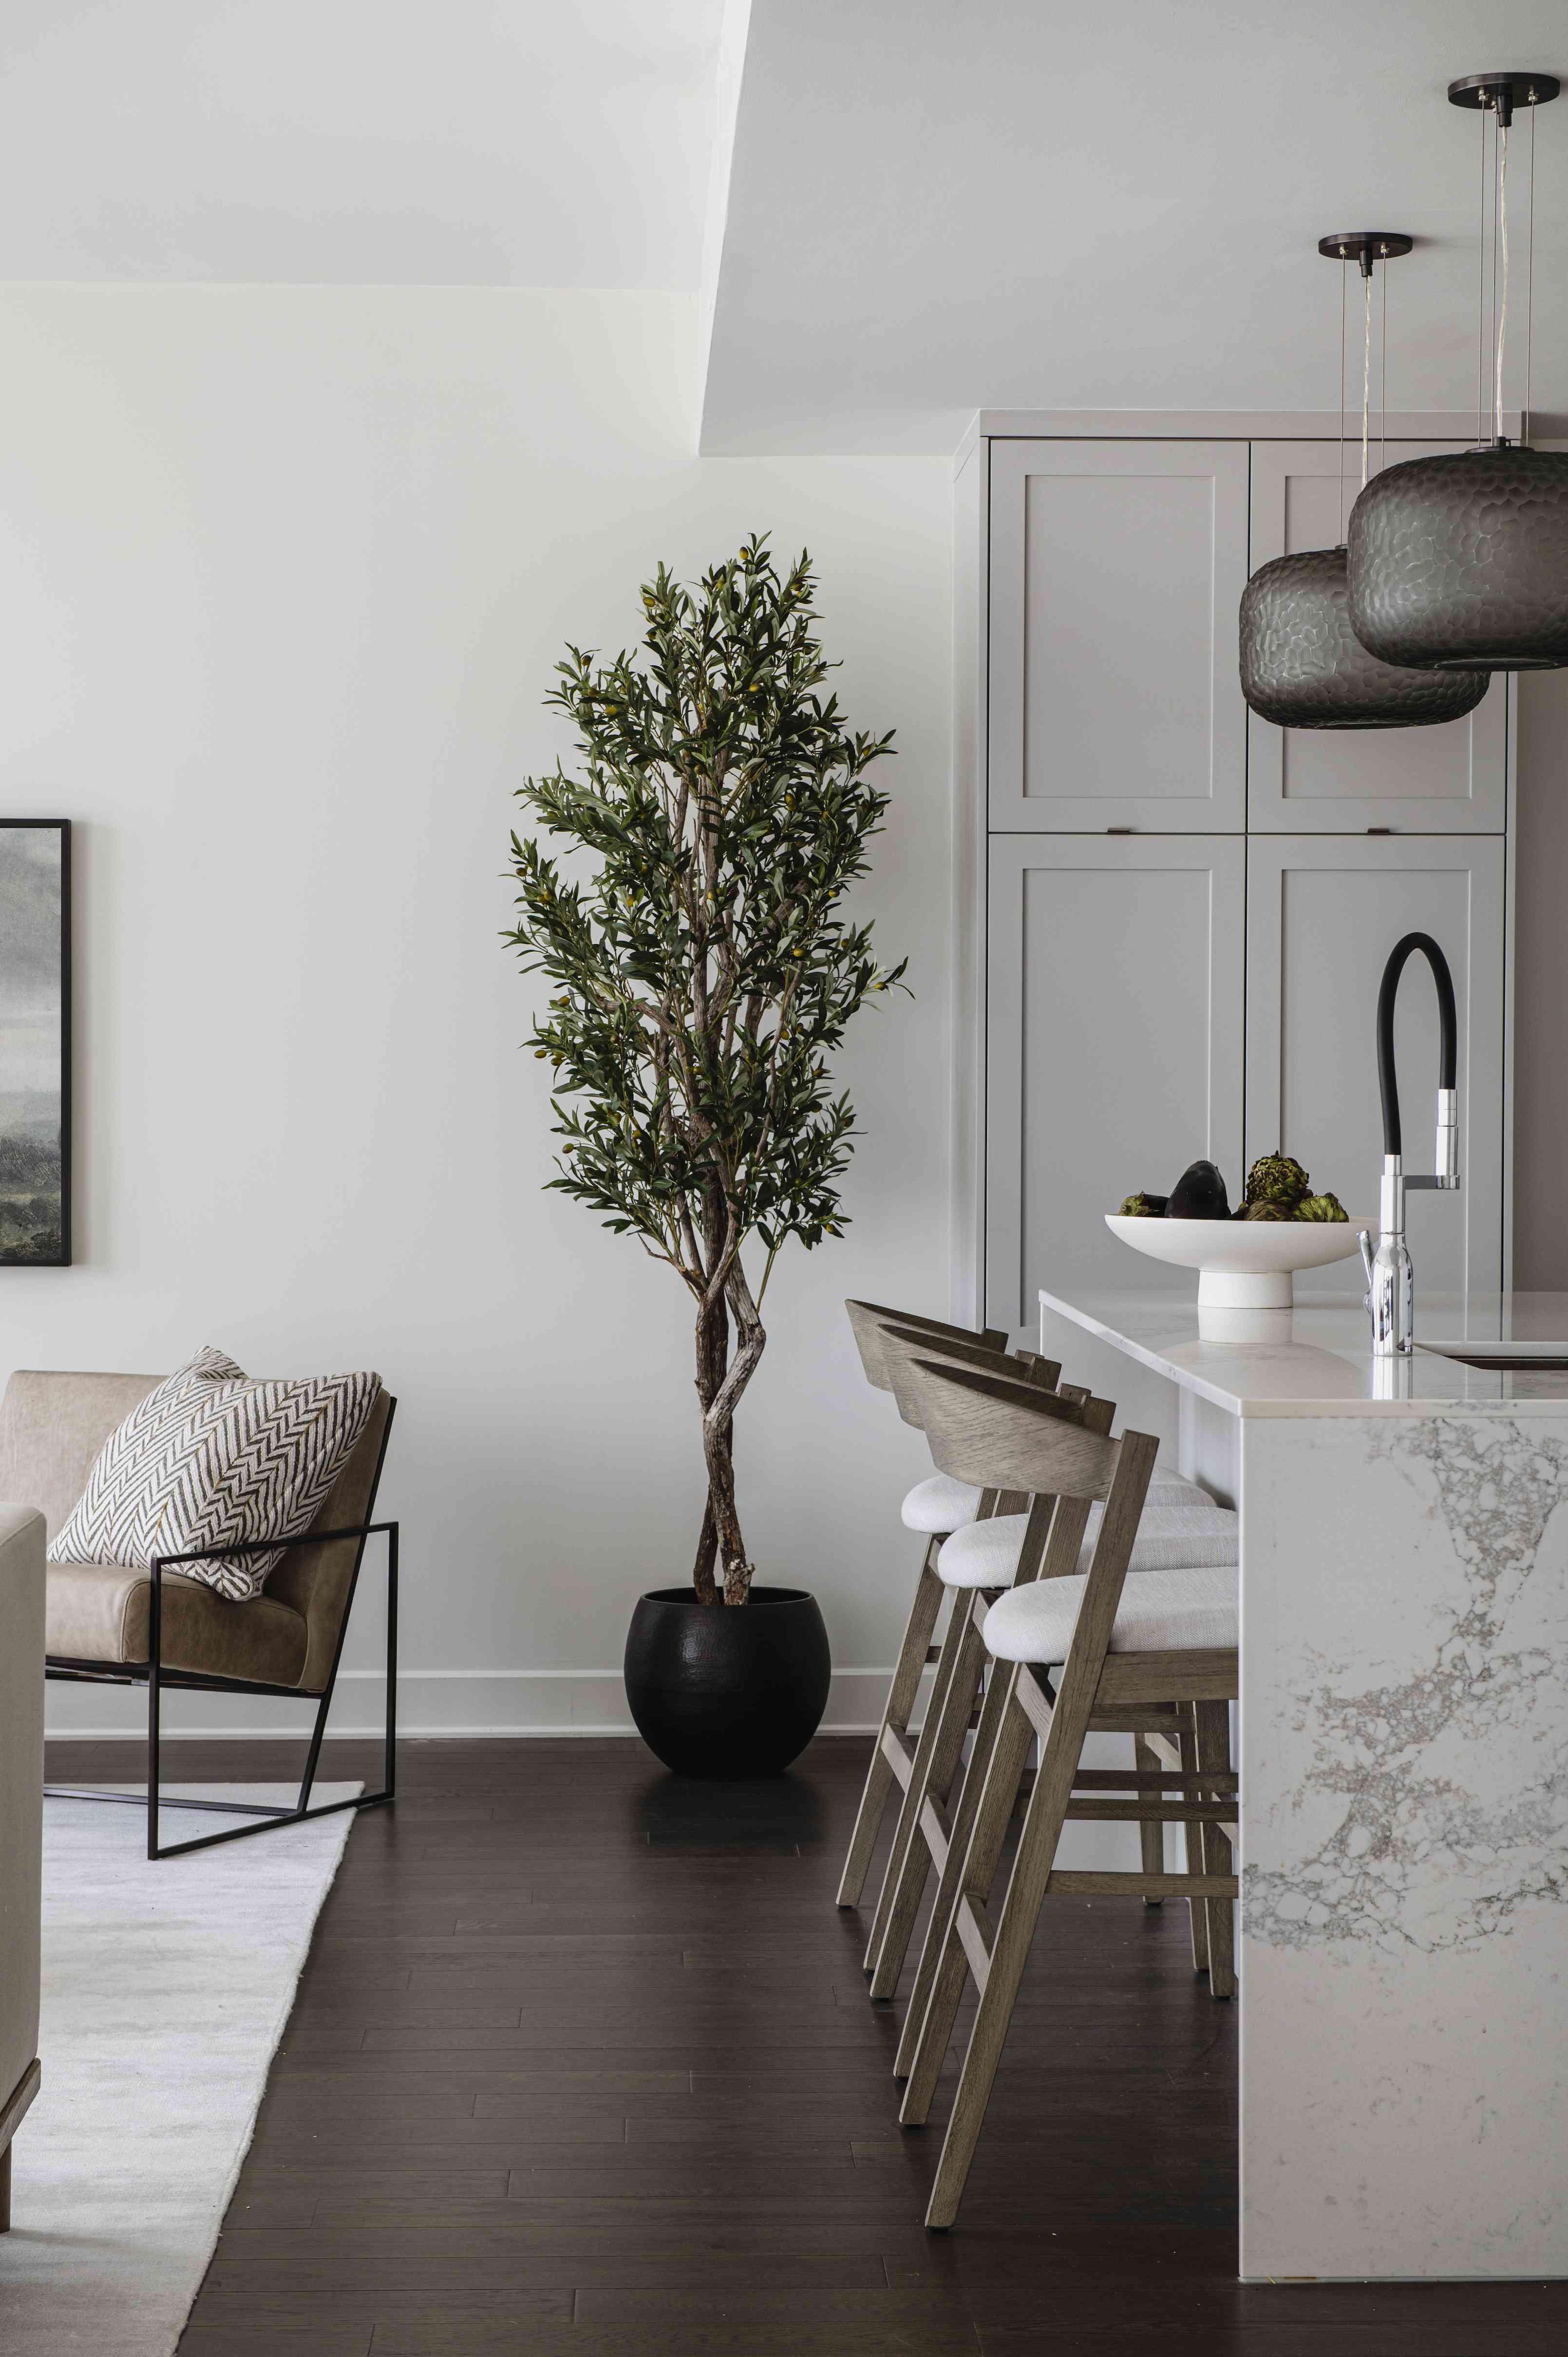 Repose Gray kitchen cabinets